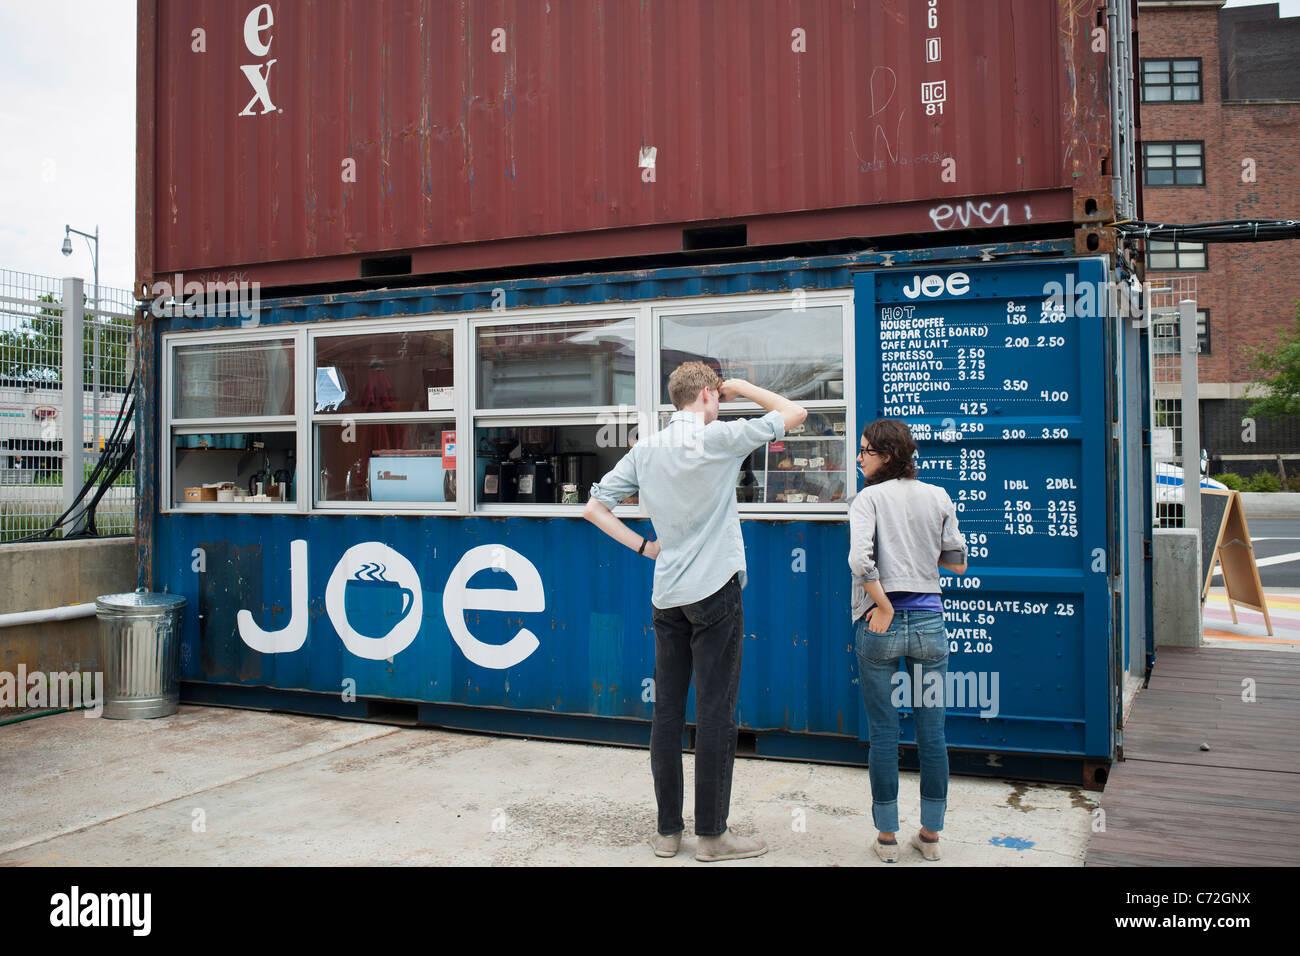 Customers peruse the menu at Joe, a coffee bar, in the Dekalb Market in downtown Brooklyn in New York - Stock Image